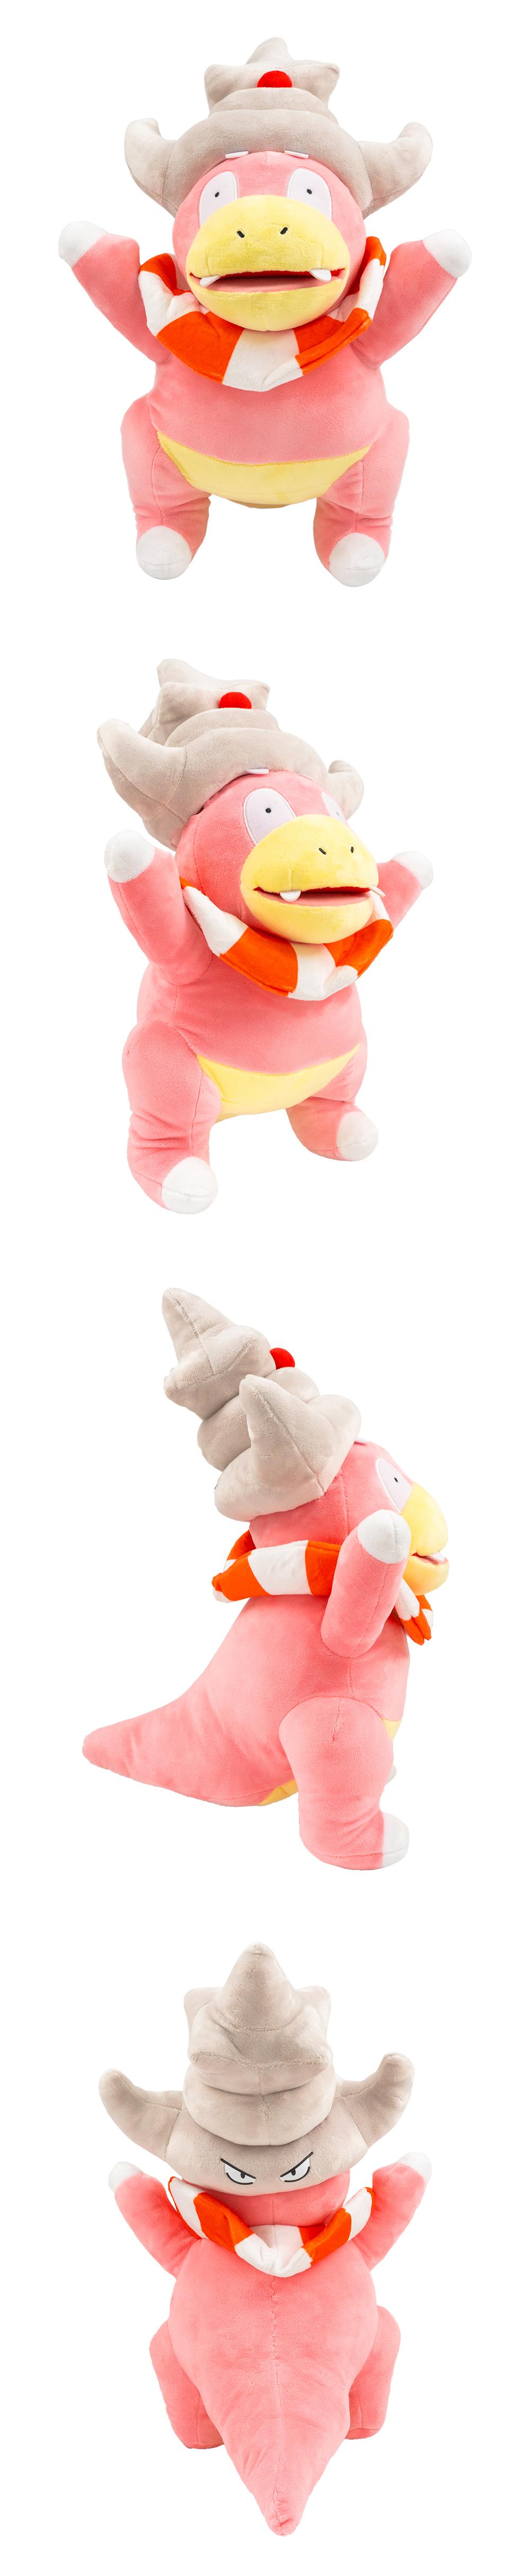 Pokemon精靈寶可夢 呆呆王30公分【PM5730200201】